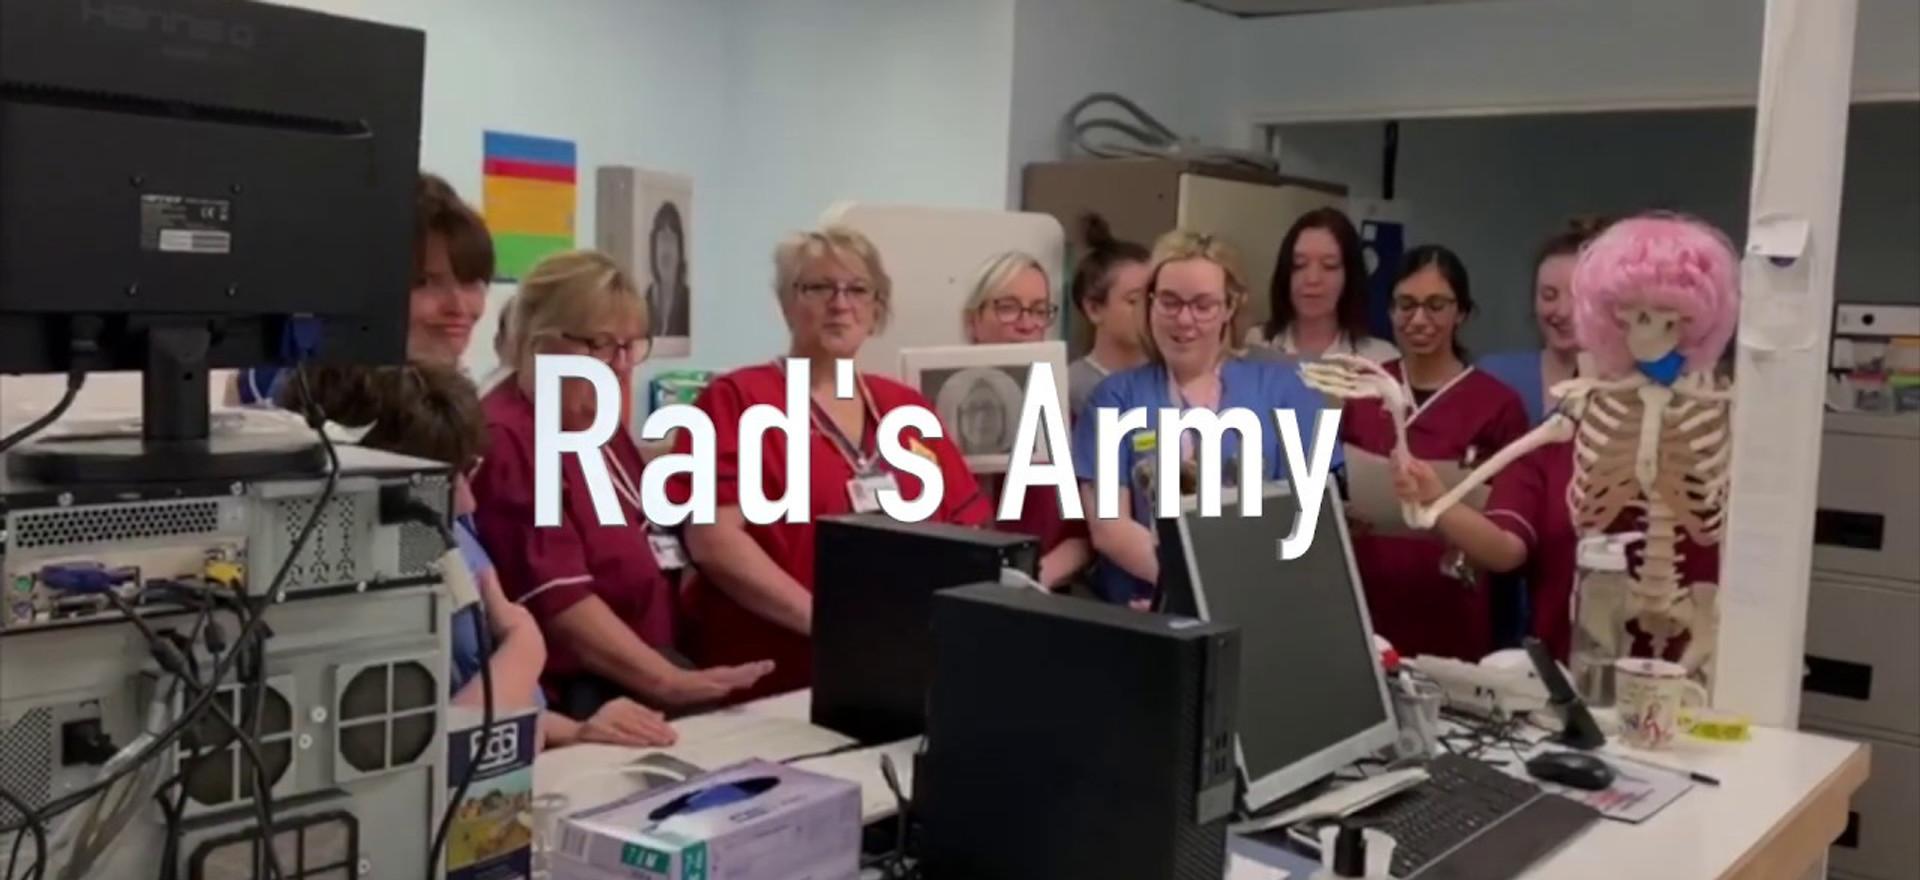 Rad's Army